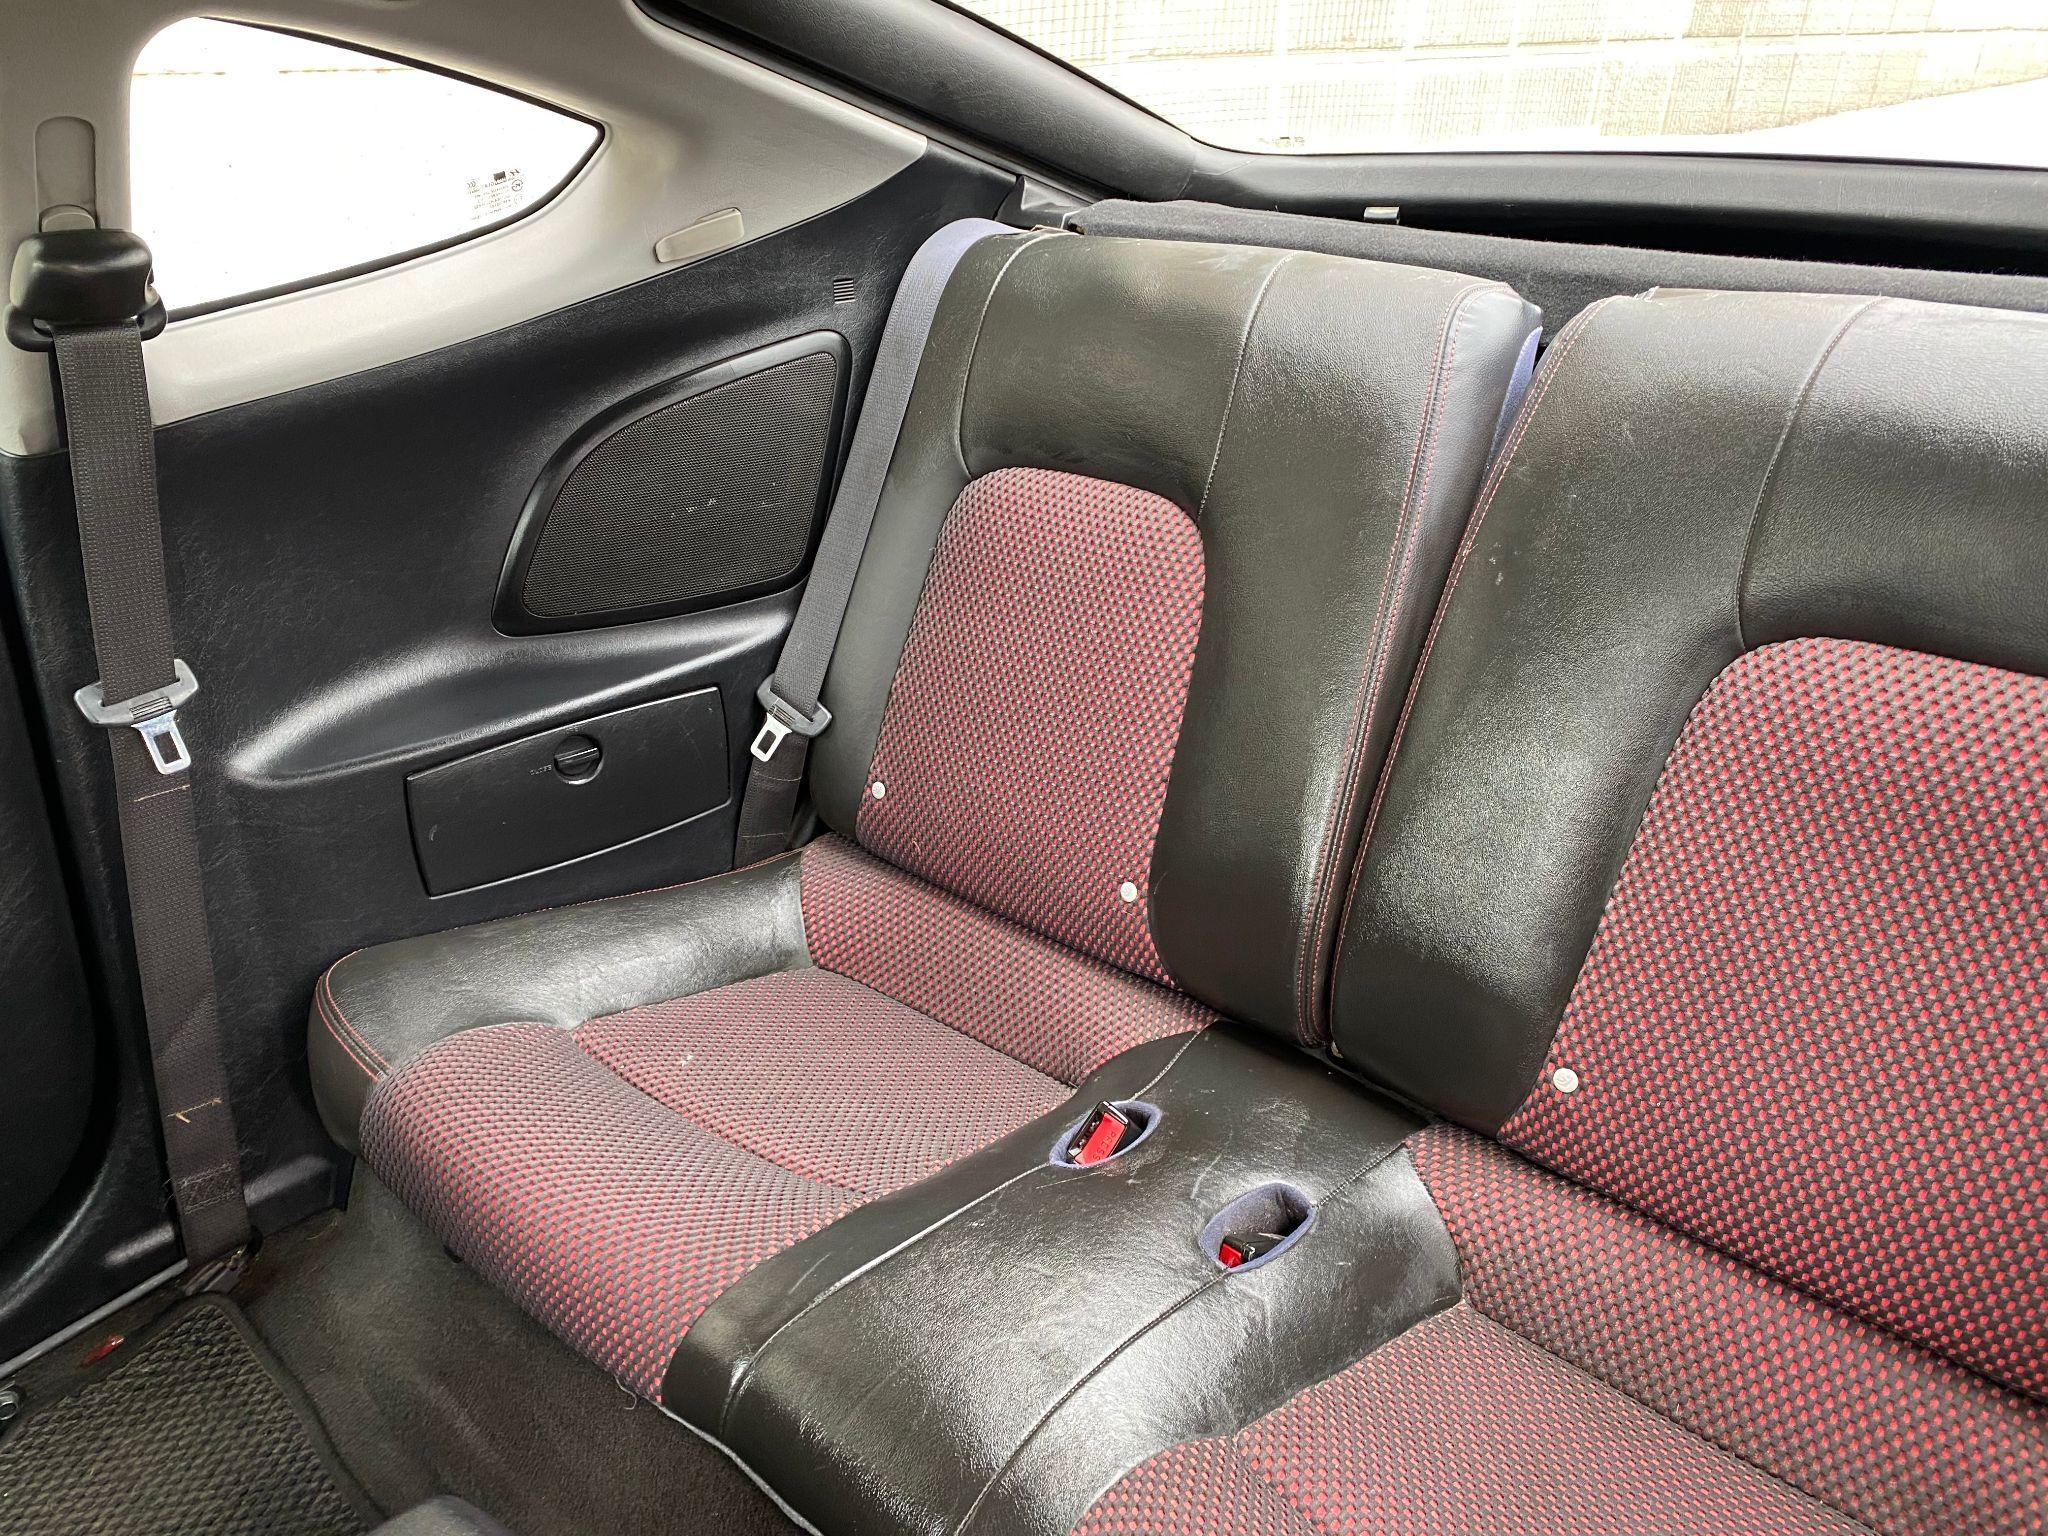 2005 Hyundai Tiburon GT